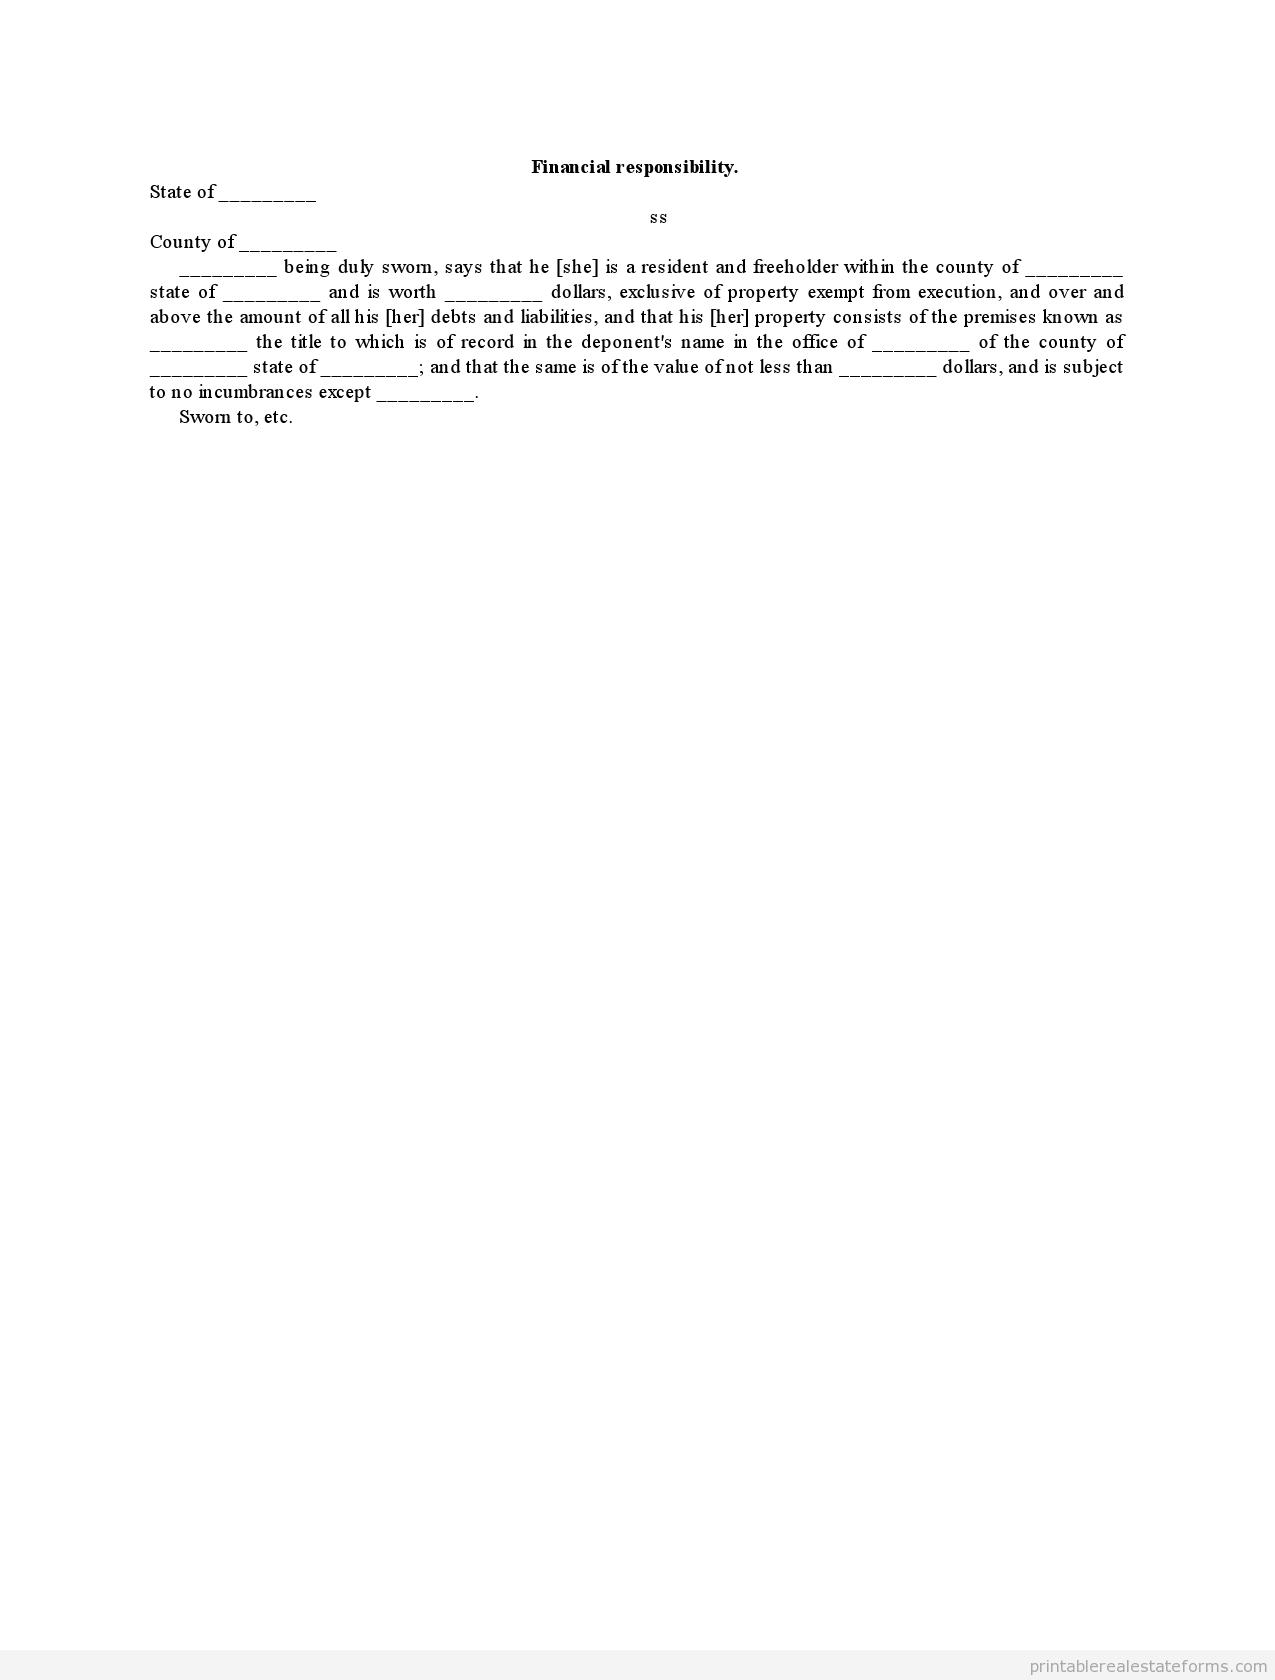 Sample Printable Financial Responsibility Form